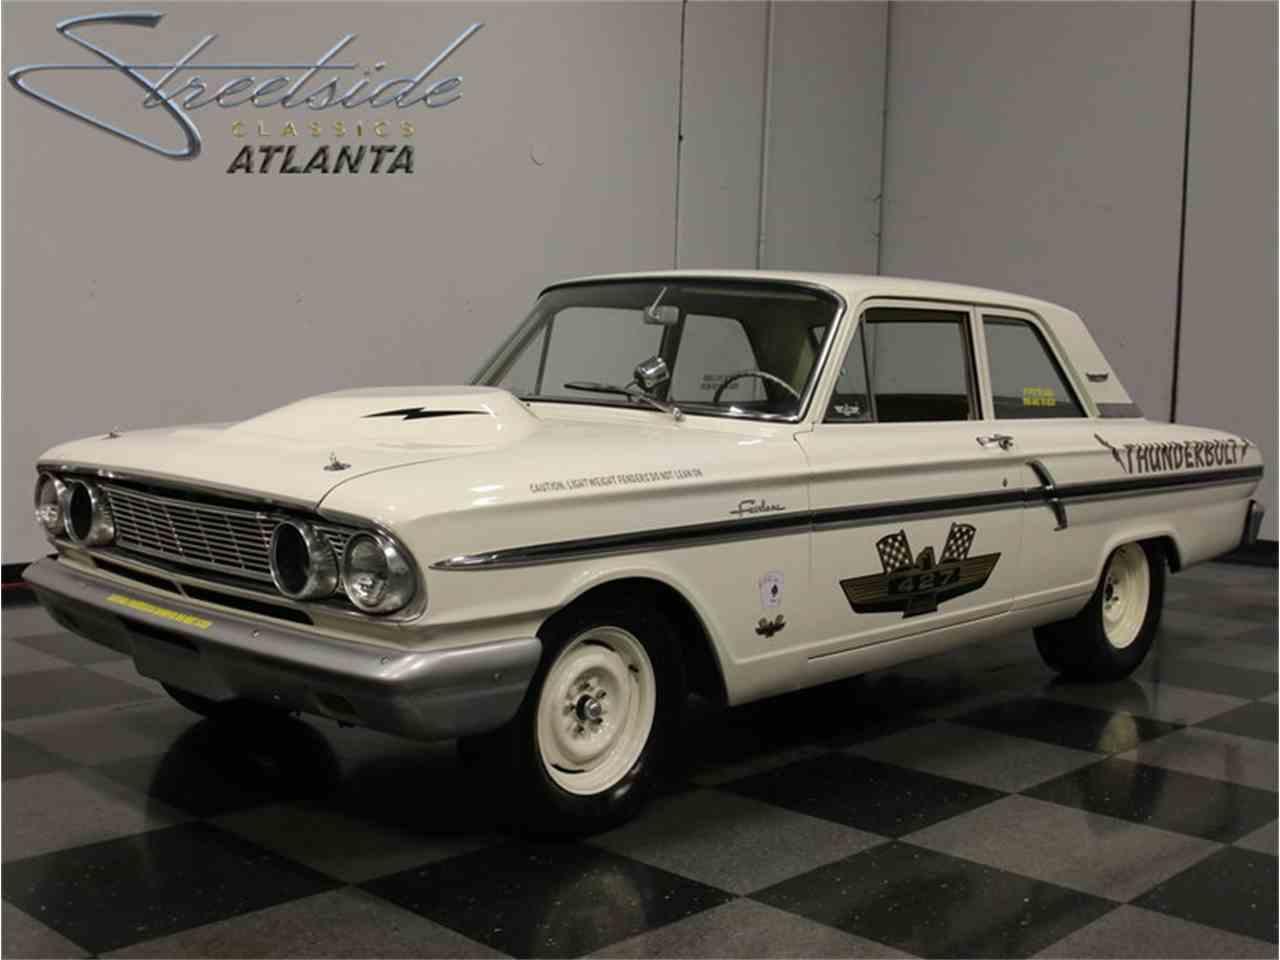 1964 Ford Fairlane Thunderbolt Tribute For Sale In Lithia Springs Georgia 30122